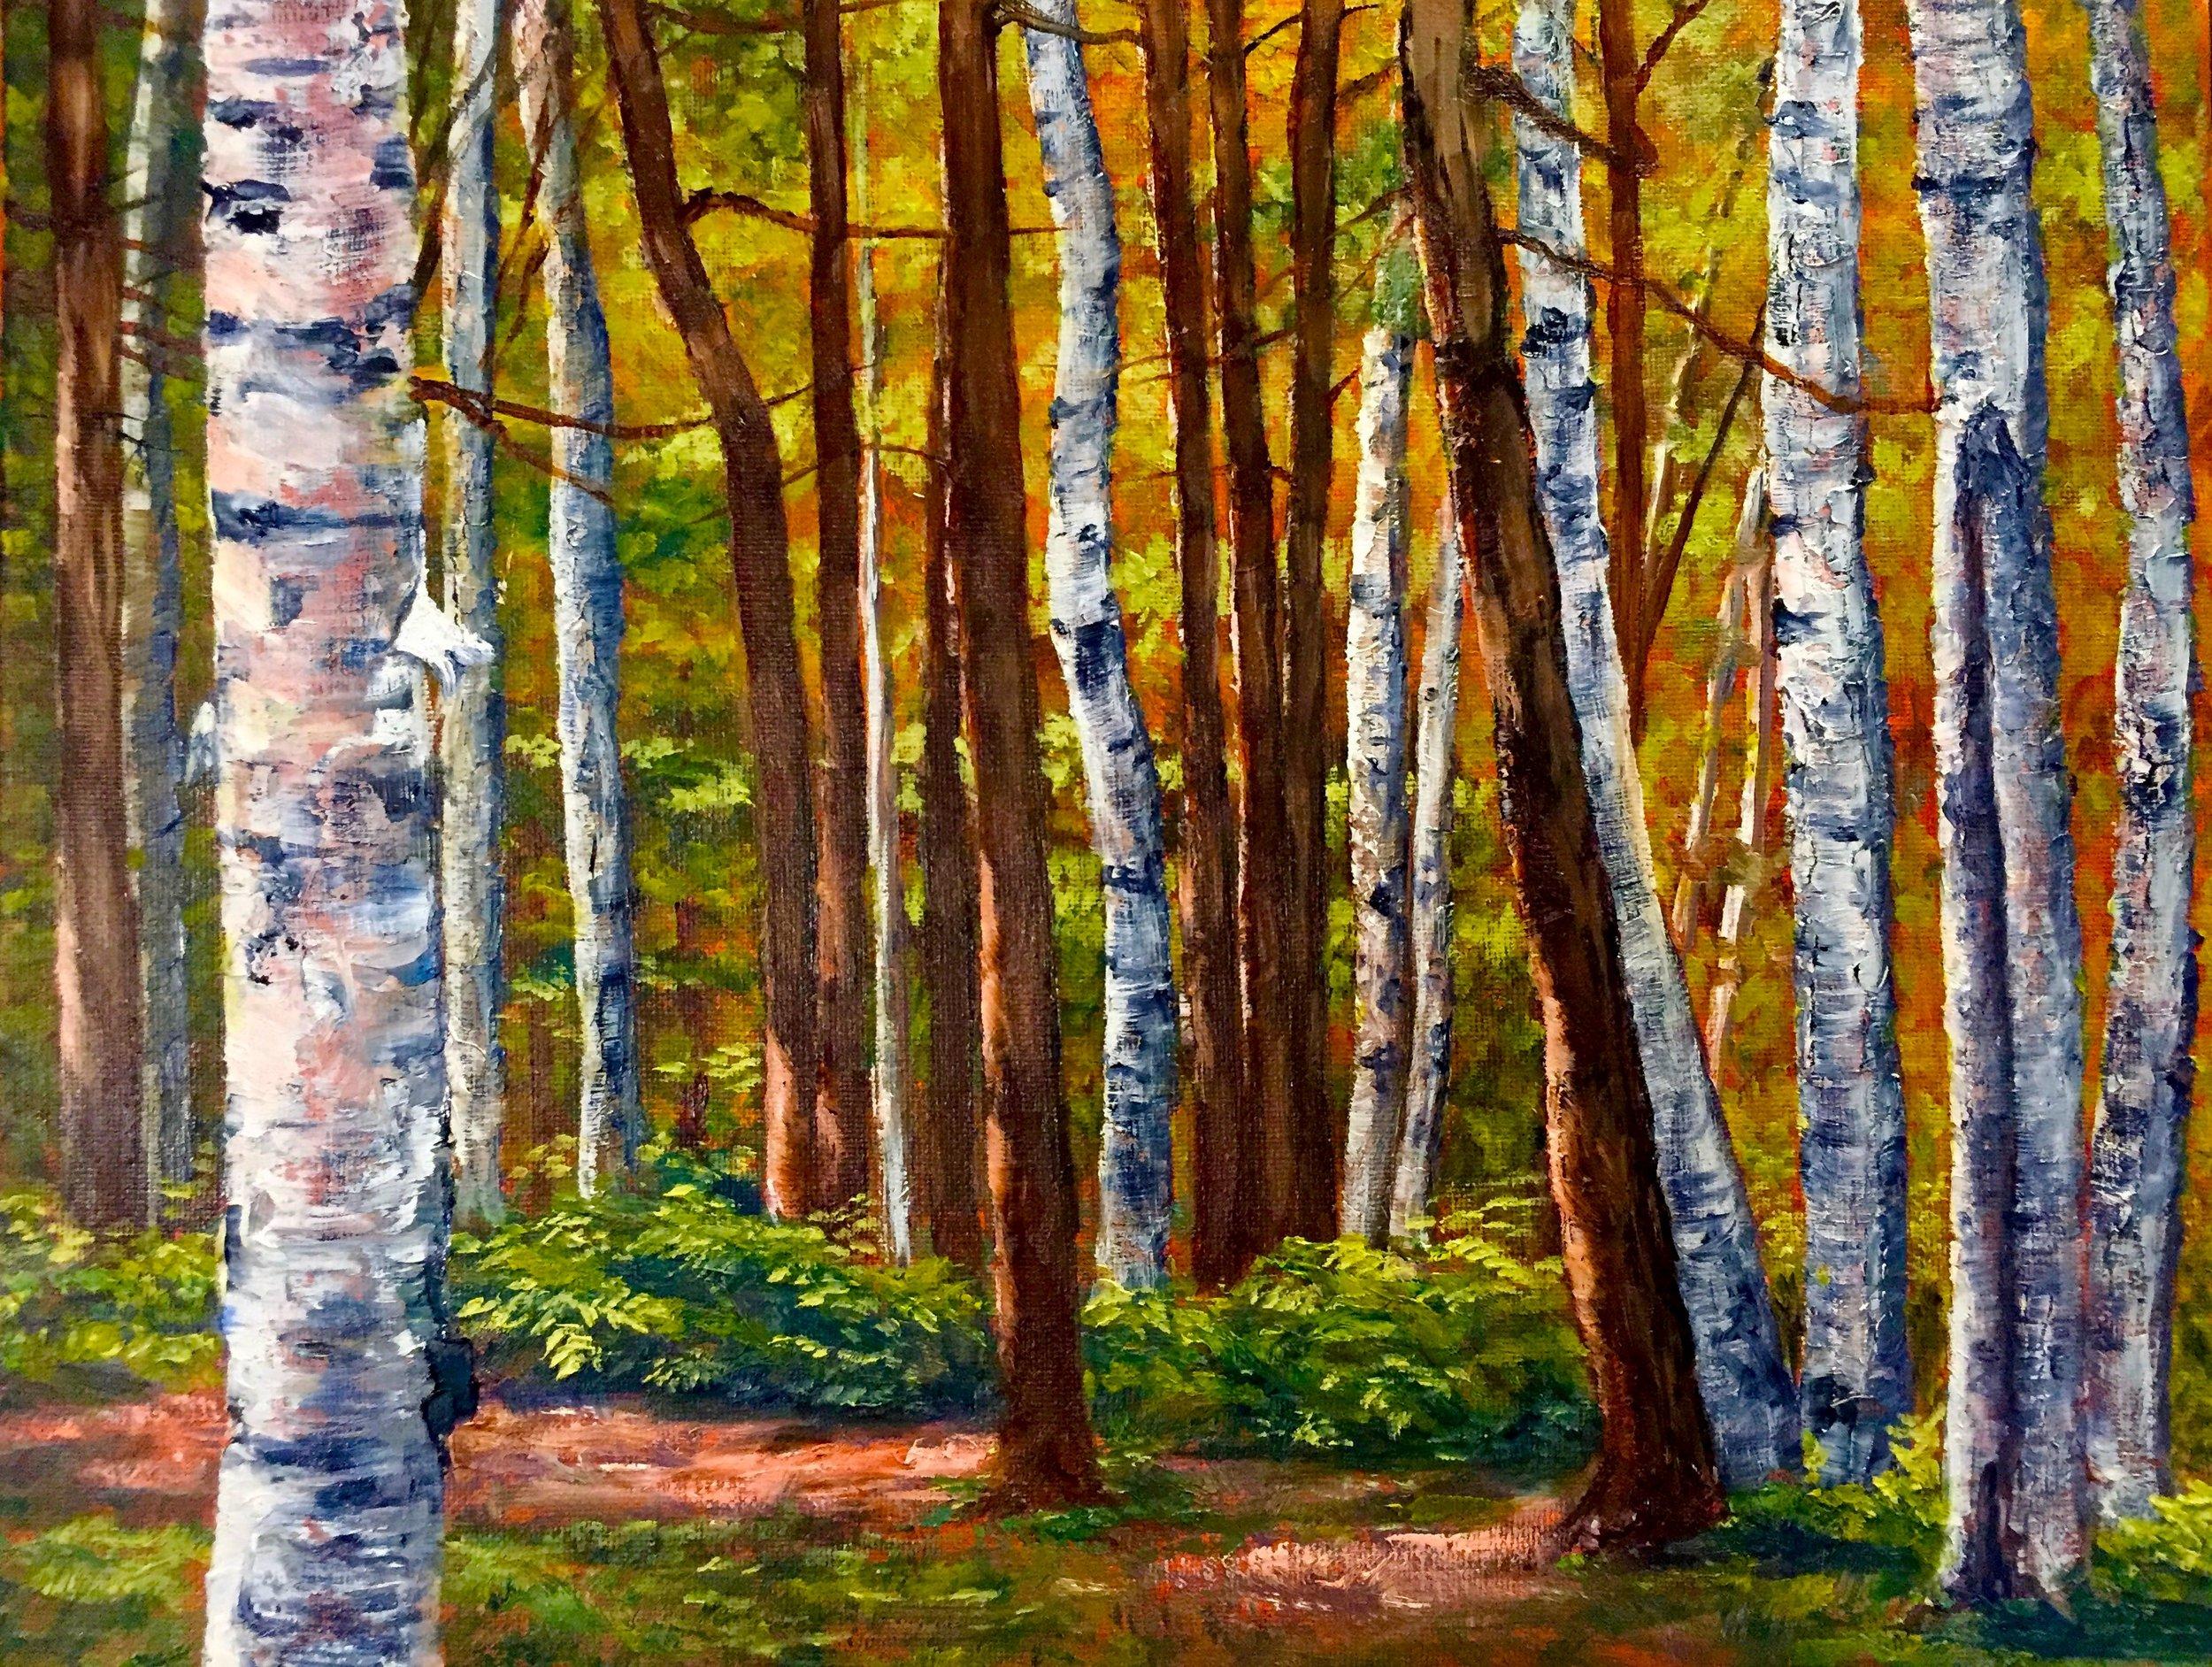 McFarland's Woods